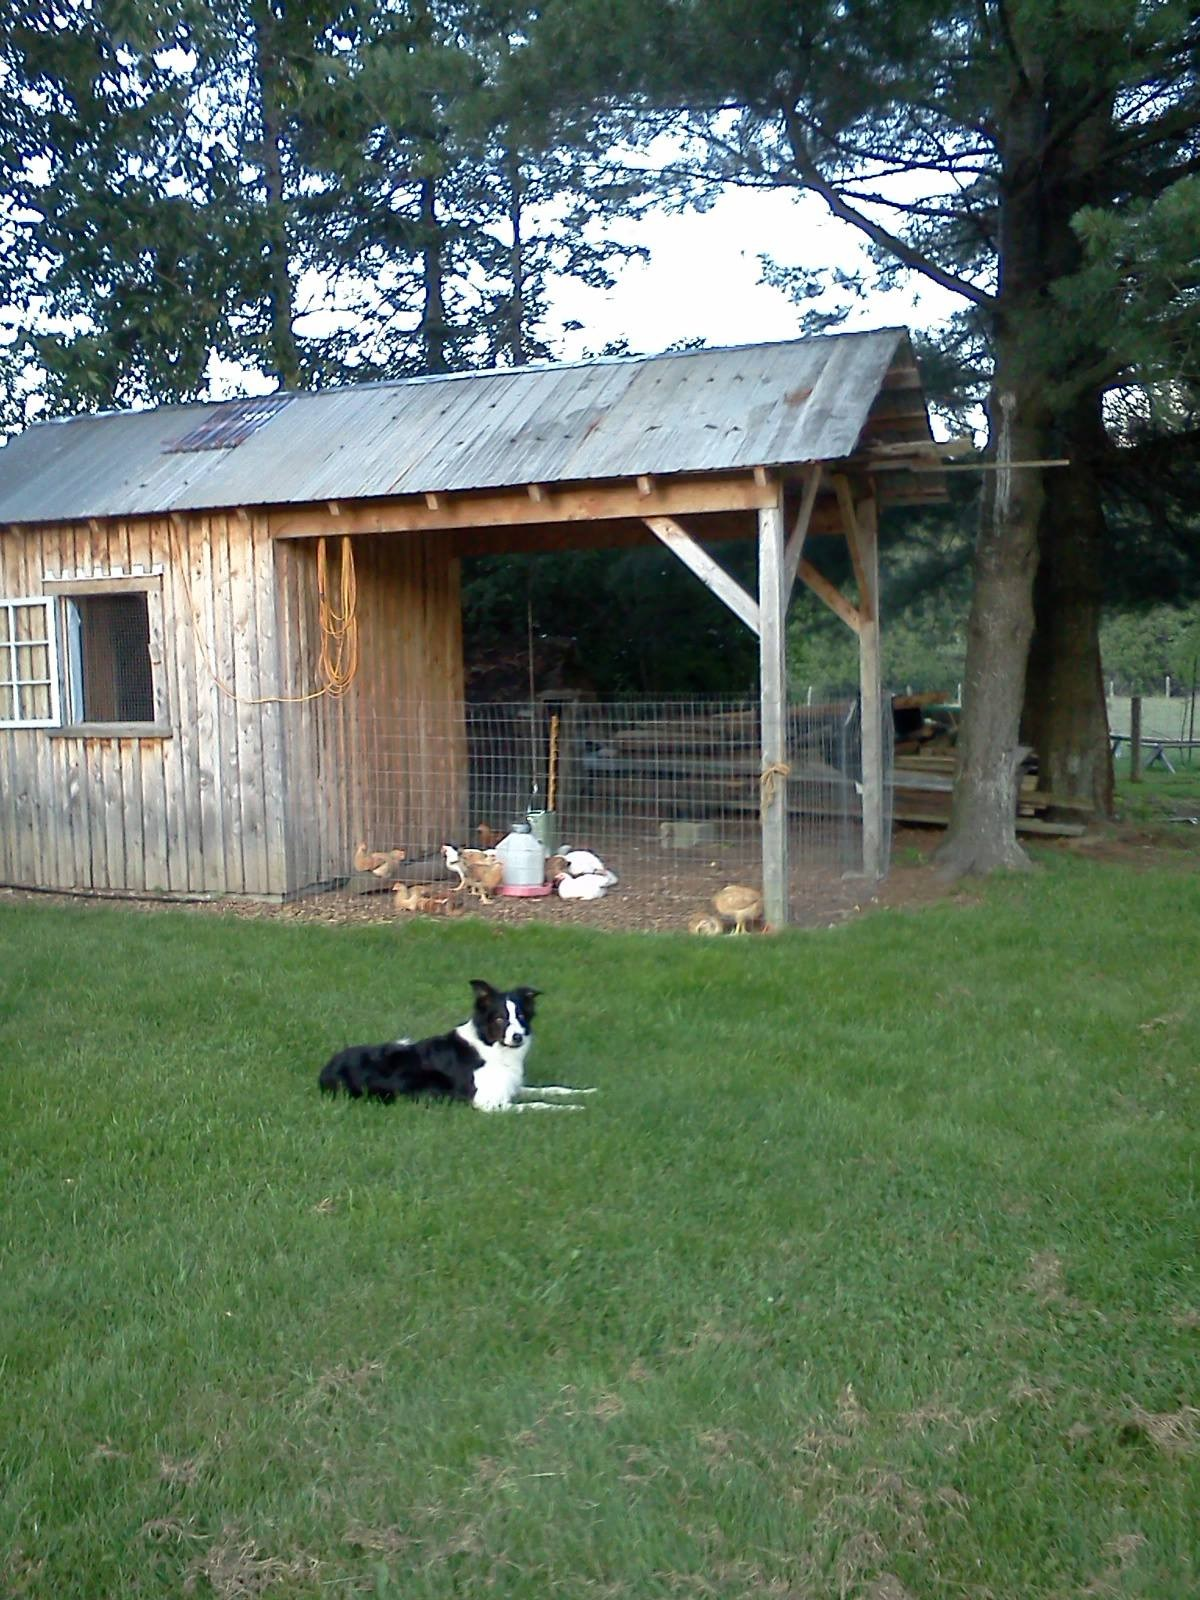 Fen on chicken duty